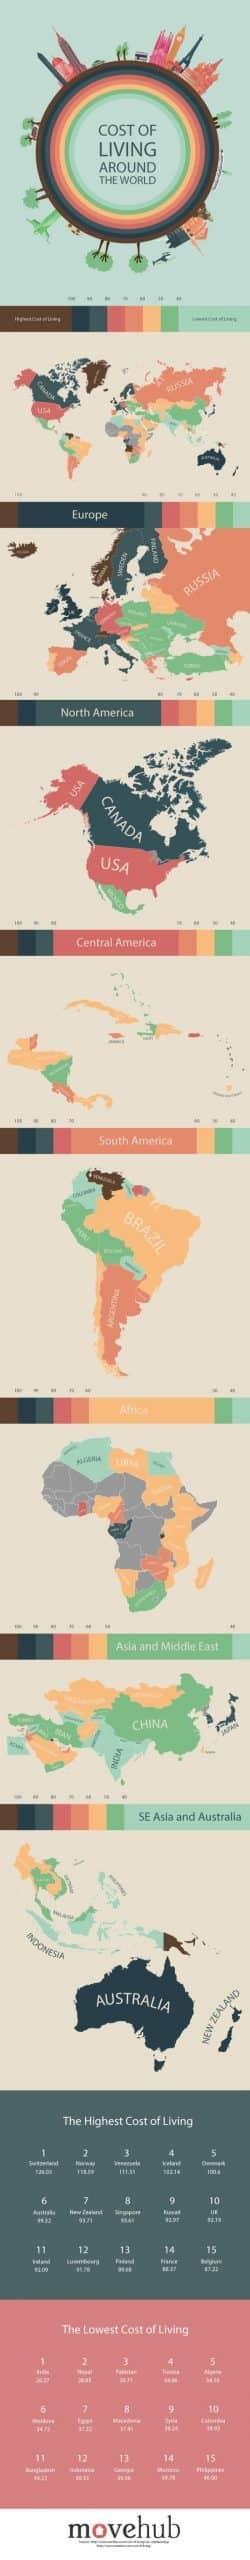 cost-of-living-around-world-infographic-4252191